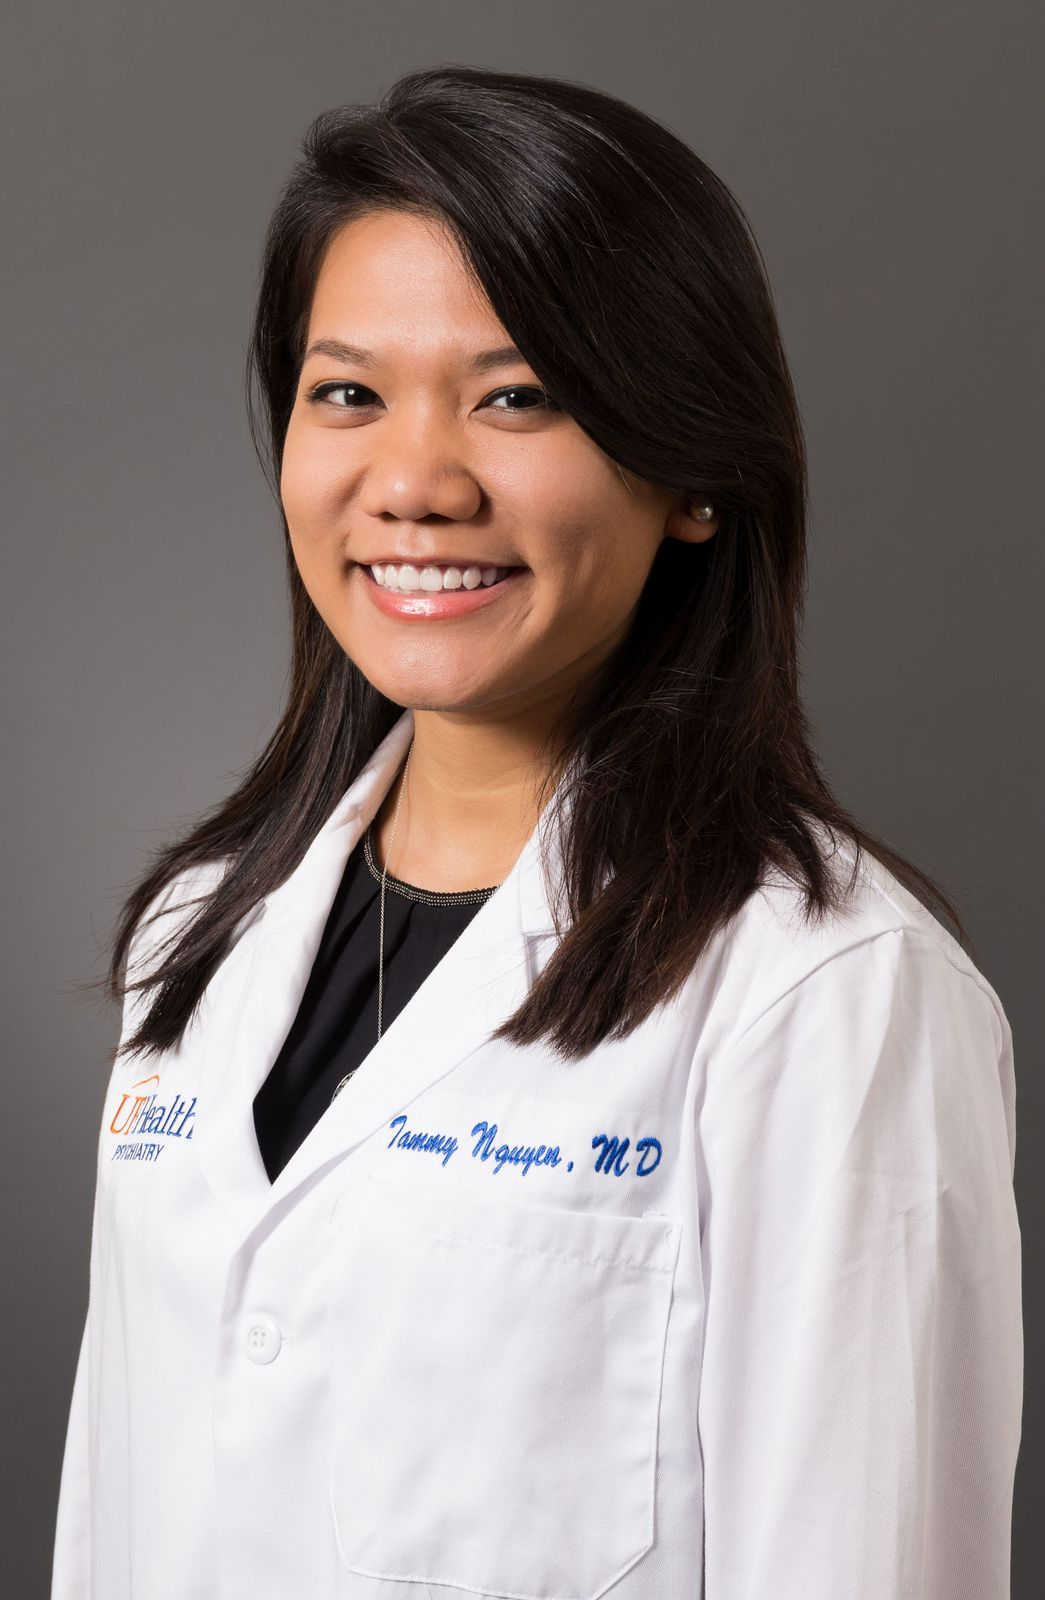 Phuong Tam Nguyen (Tammy), MD